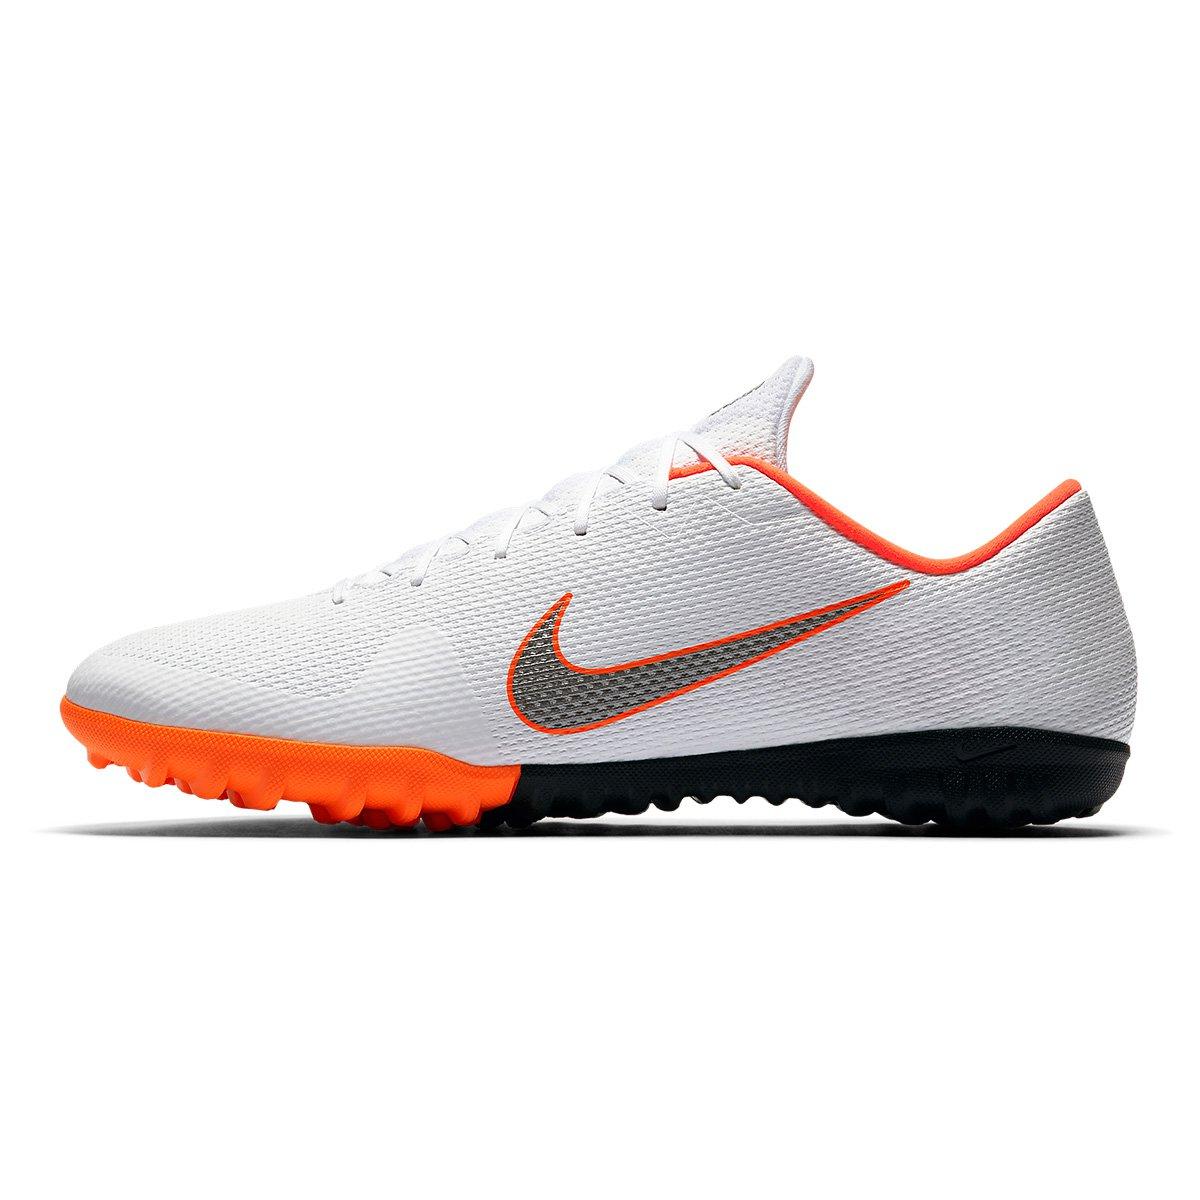 b7c37c5f23 Chuteira Society Nike Mercurial Vapor 12 Academy - Branco e Cinza ...